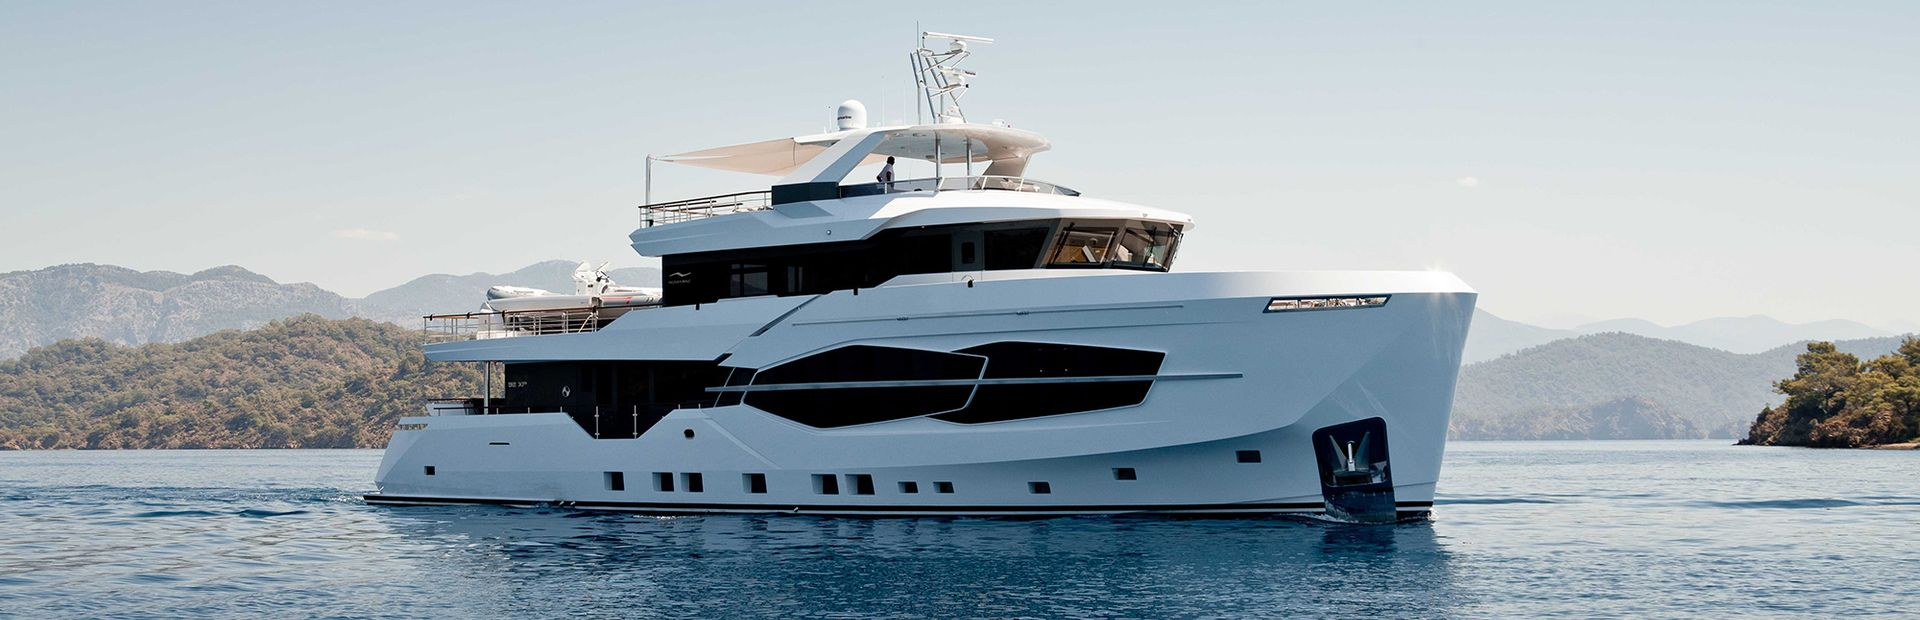 32 XP Yacht Charter